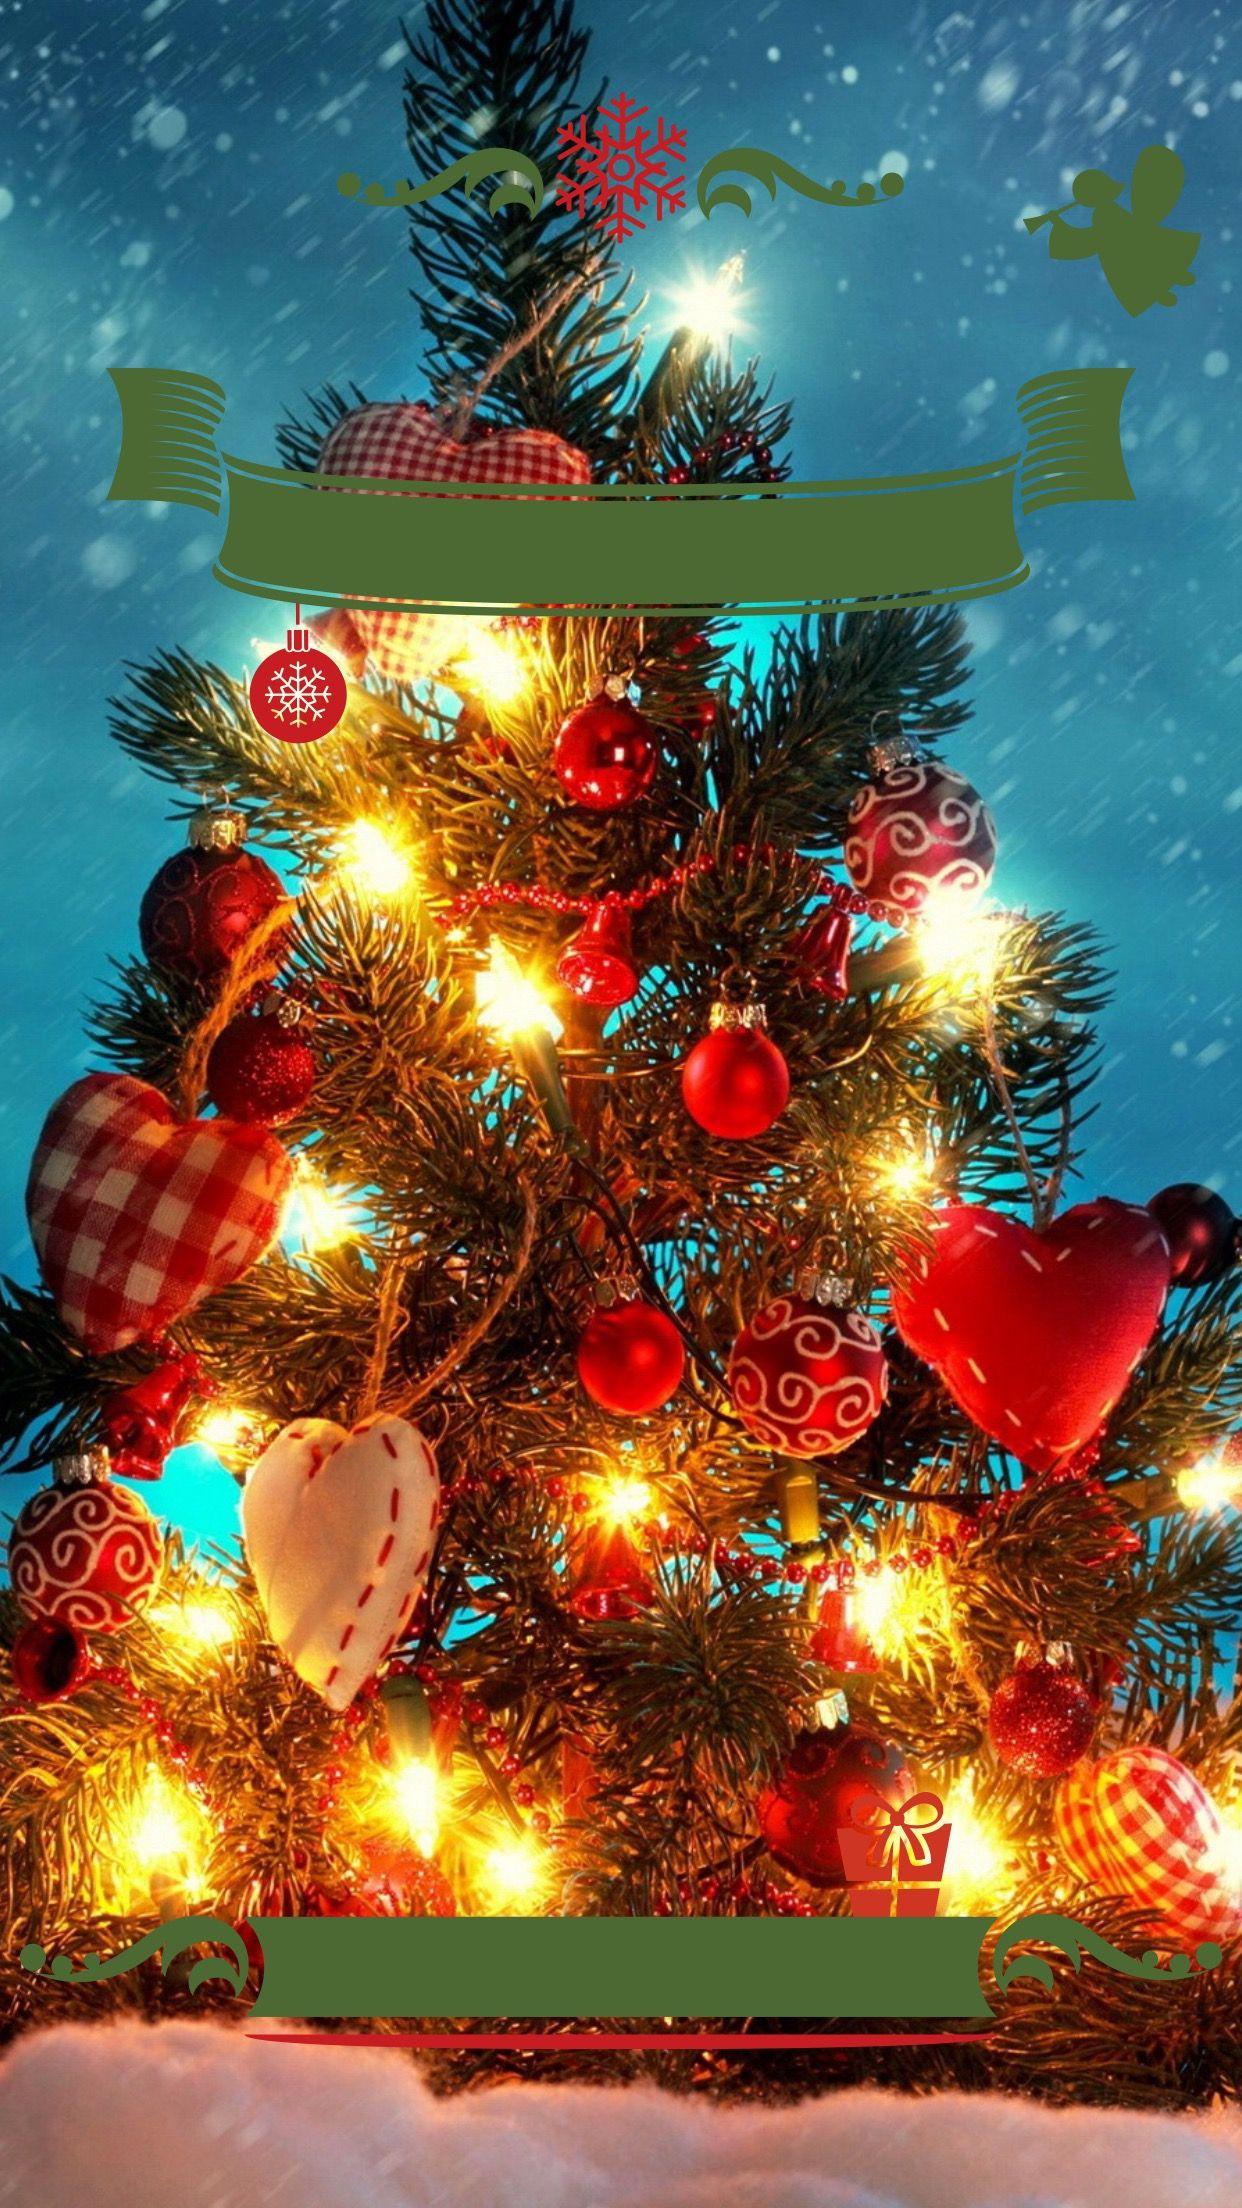 TAP AND GET THE FREE APP! Lockscreens Art Creative Holiday Happy Christmas Presents Tree ...